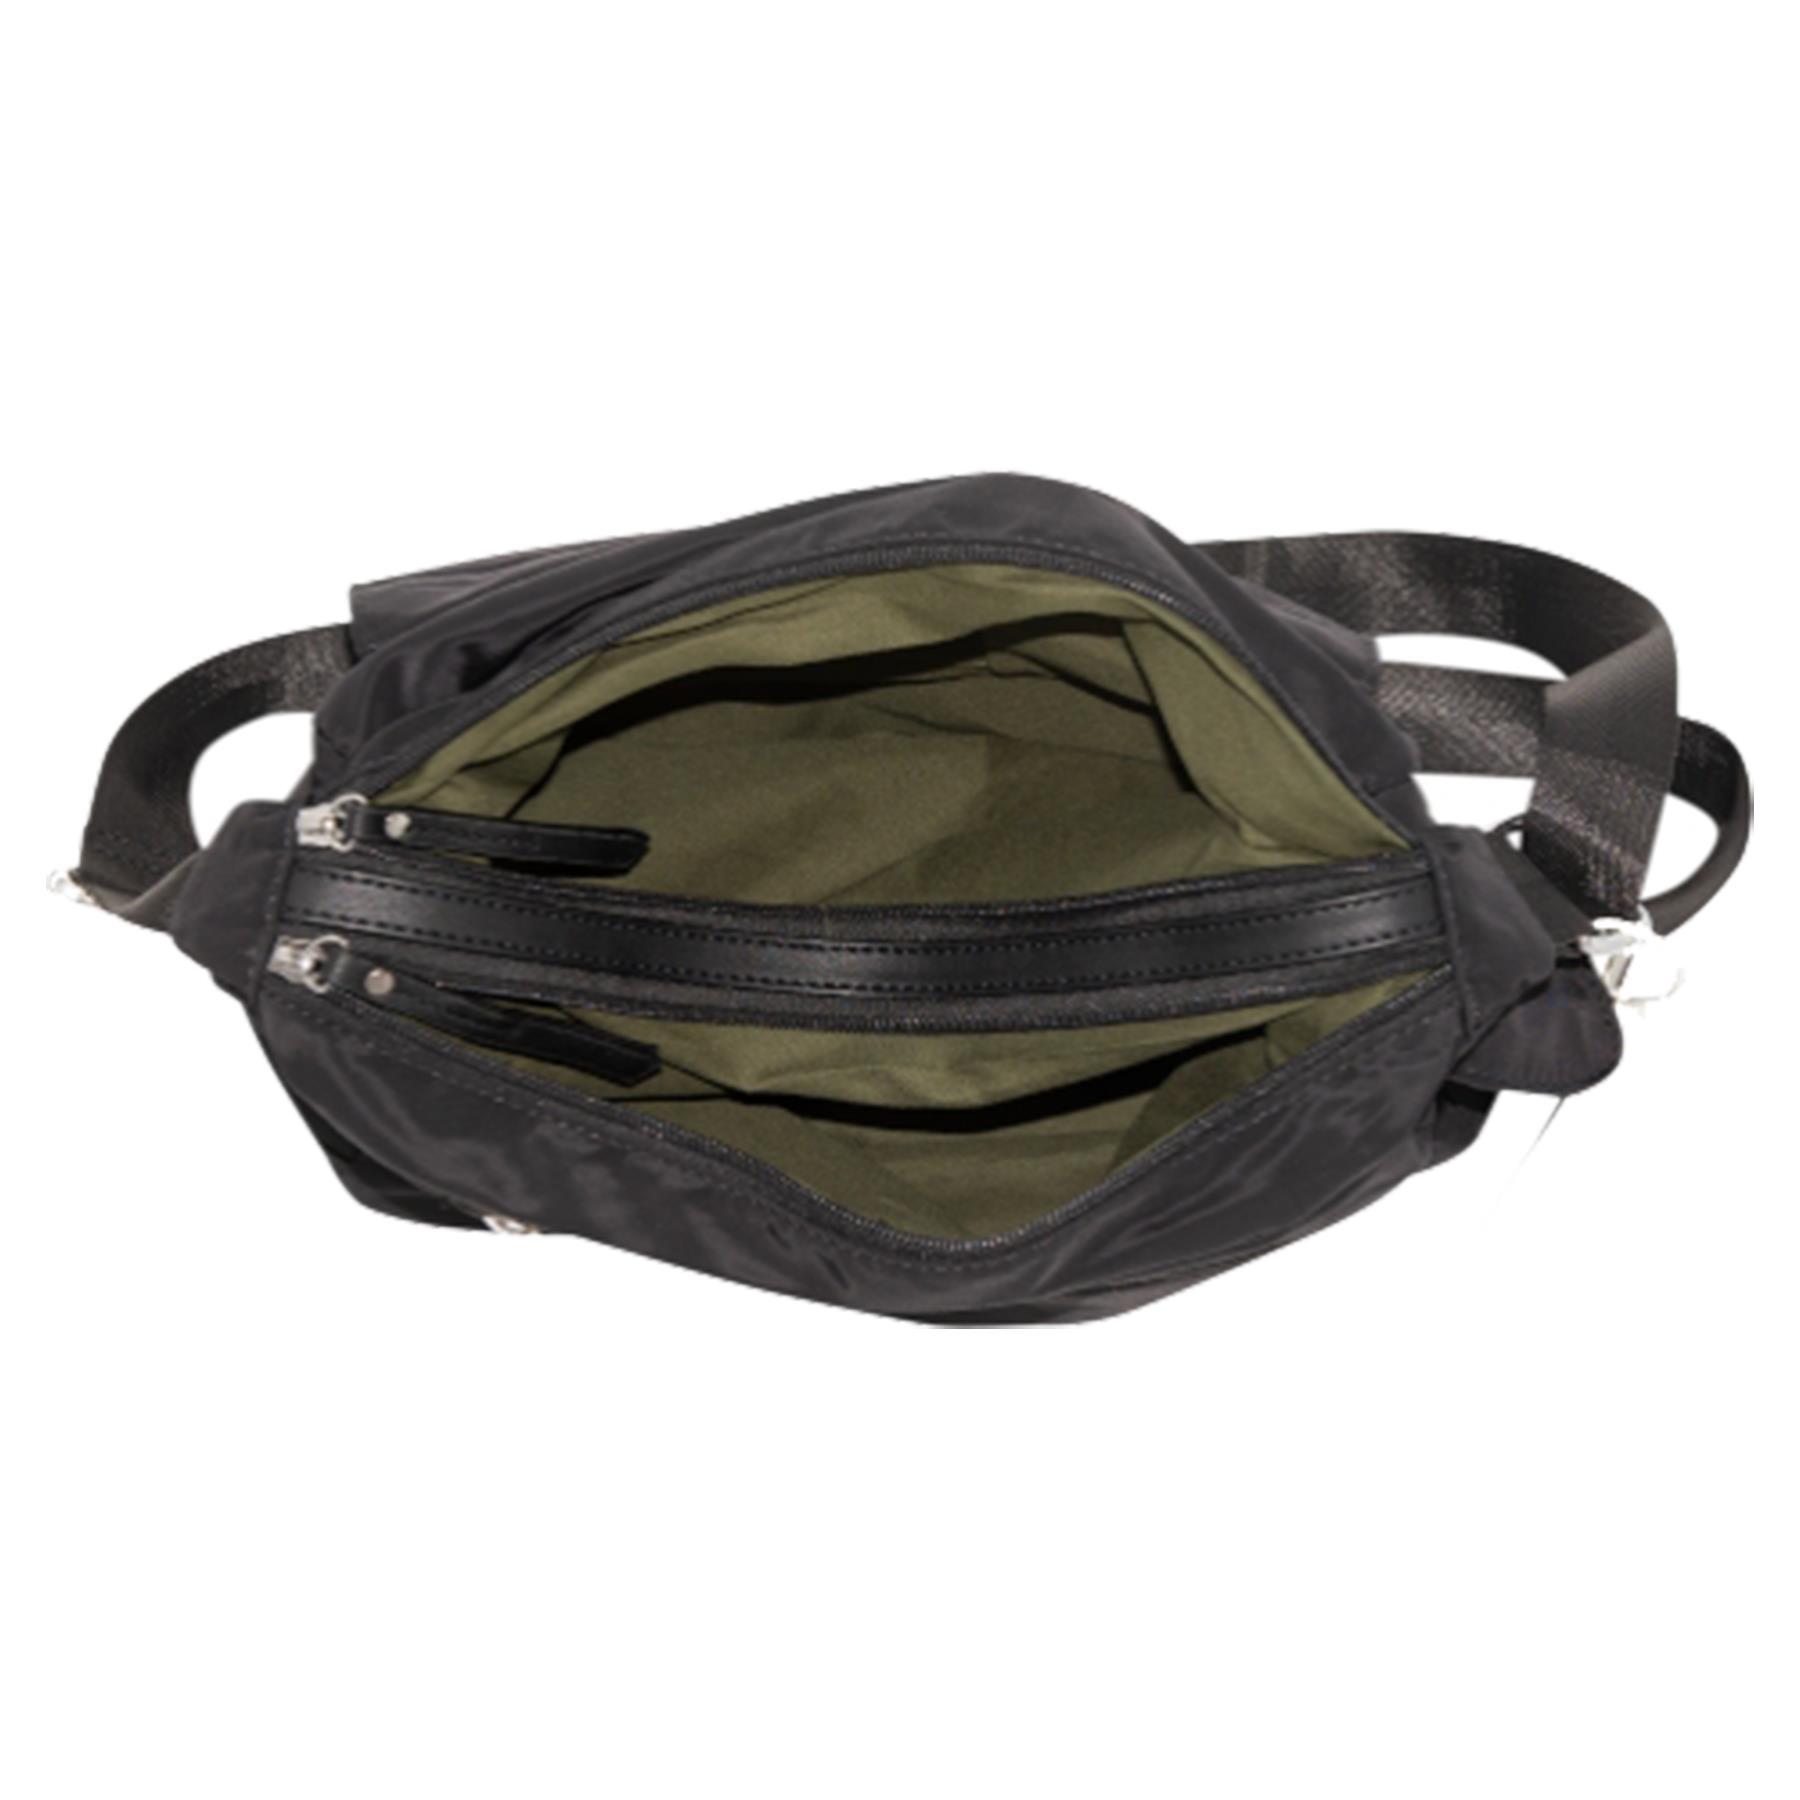 New-Ladies-Men-s-Showerproof-School-College-Practical-Basic-Crossbody-Bag thumbnail 8